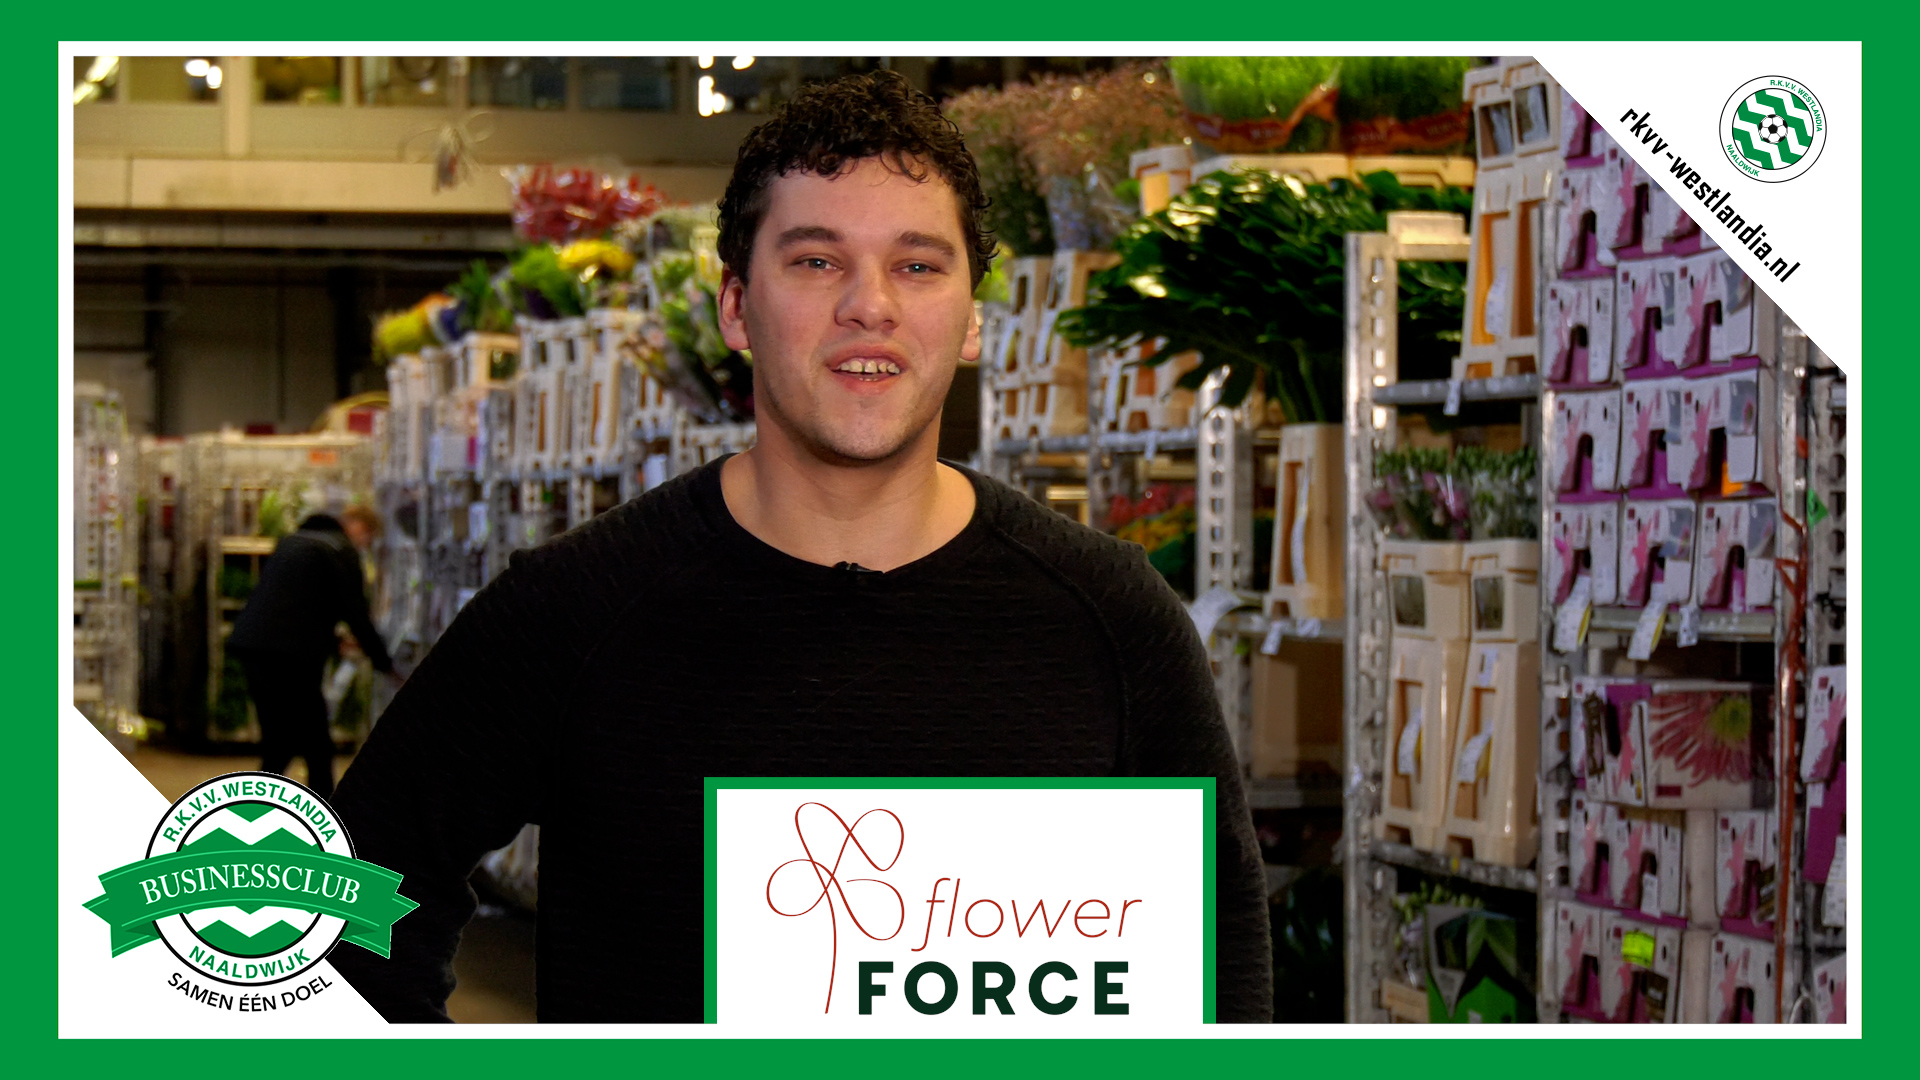 FlowerForce X Westlandia - 'Warme band met kwekers door middel van sponsoring'